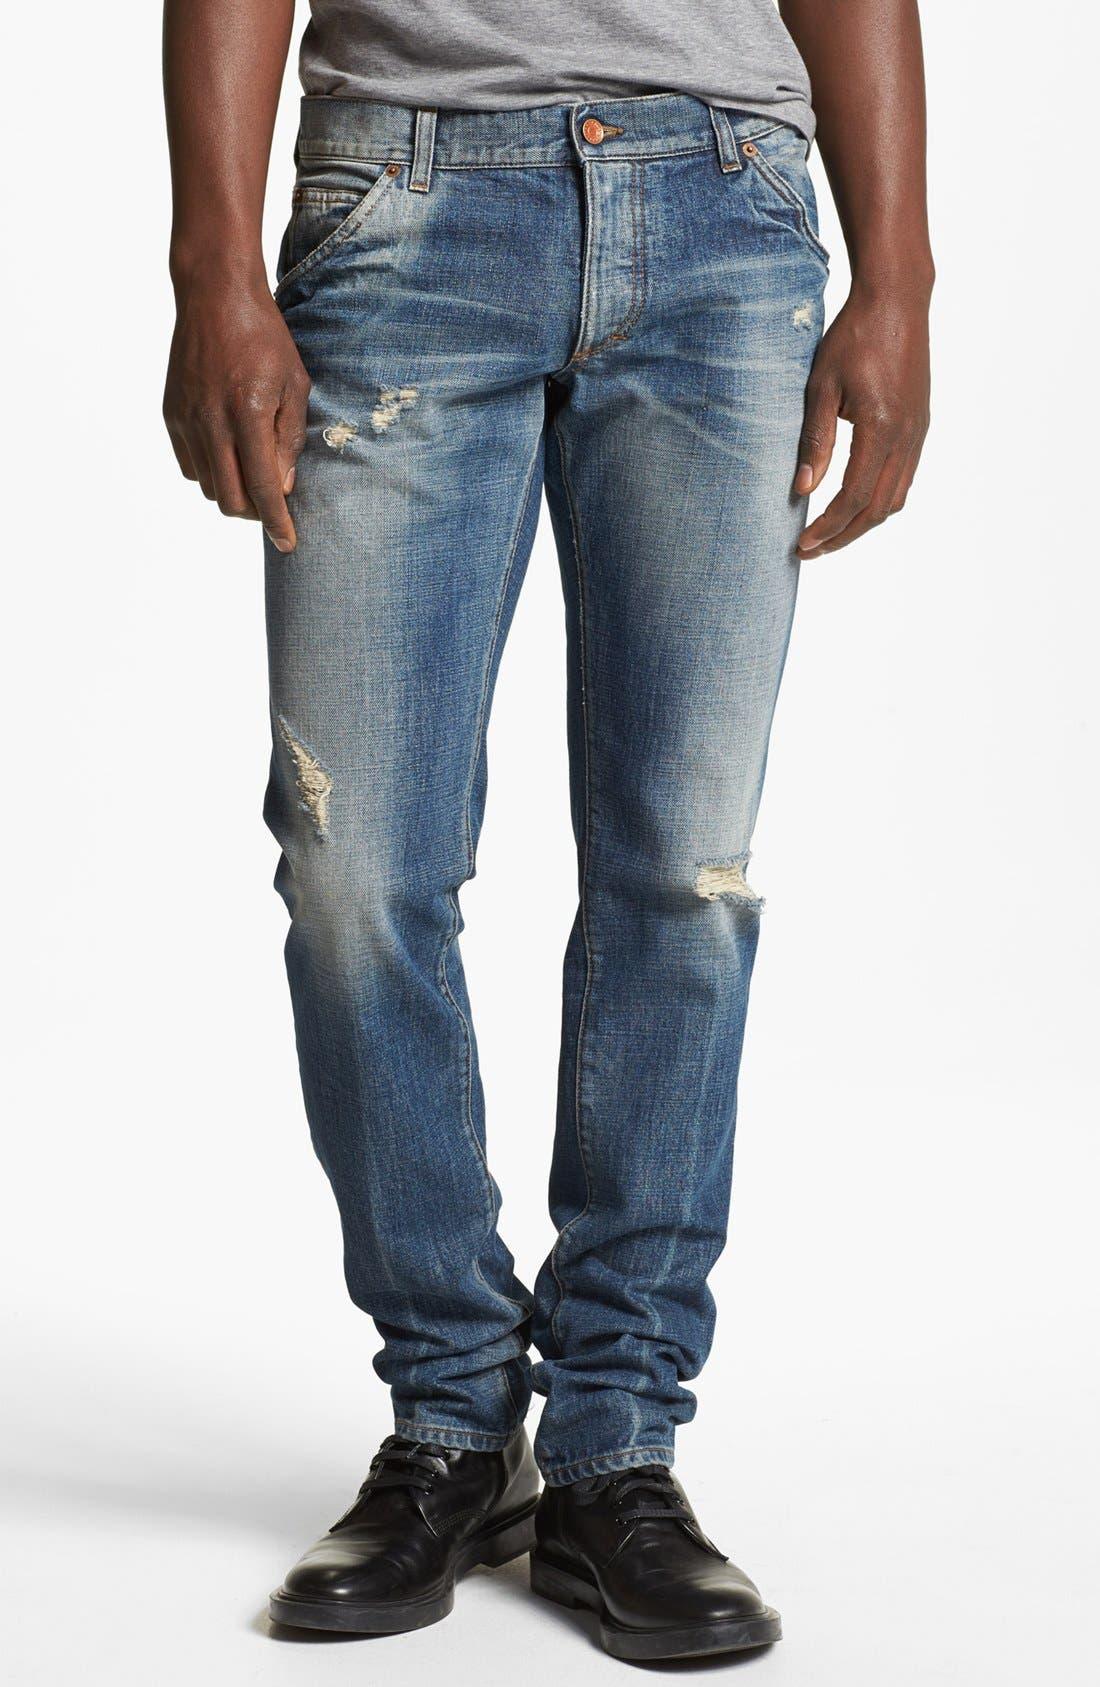 Alternate Image 1 Selected - Dolce&Gabbana Slim Fit Jeans (Light Blue)